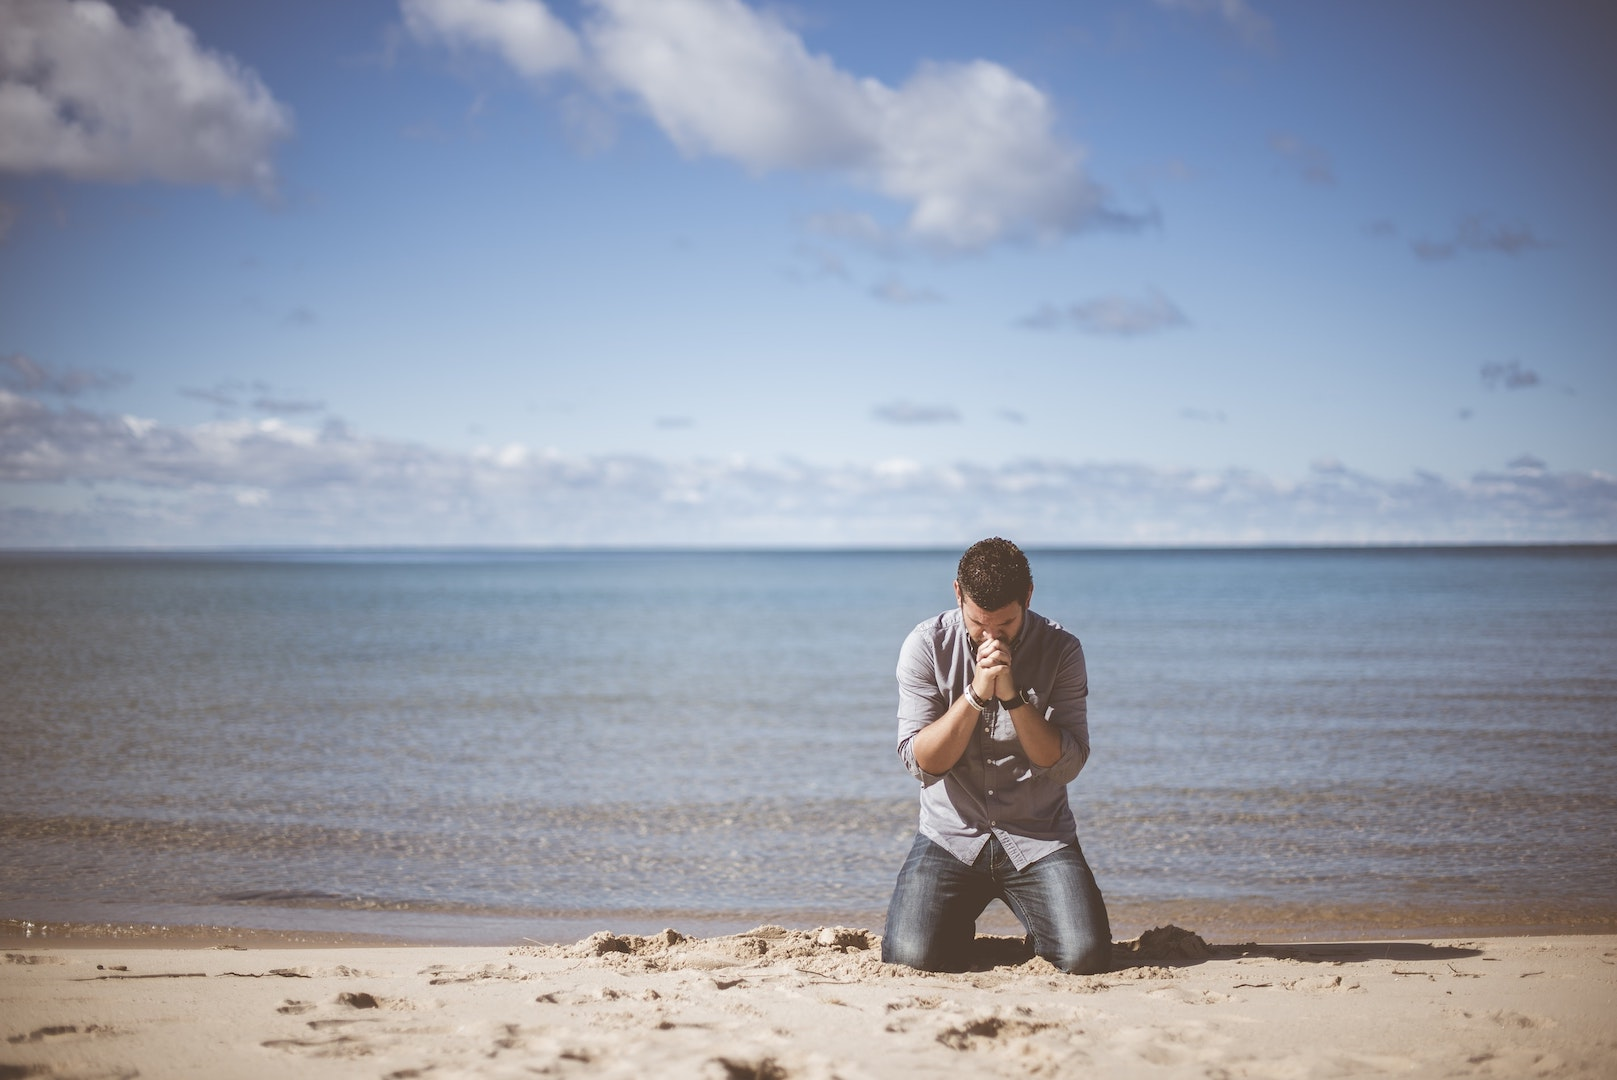 Meditation and Gratitude - YFS Magazine